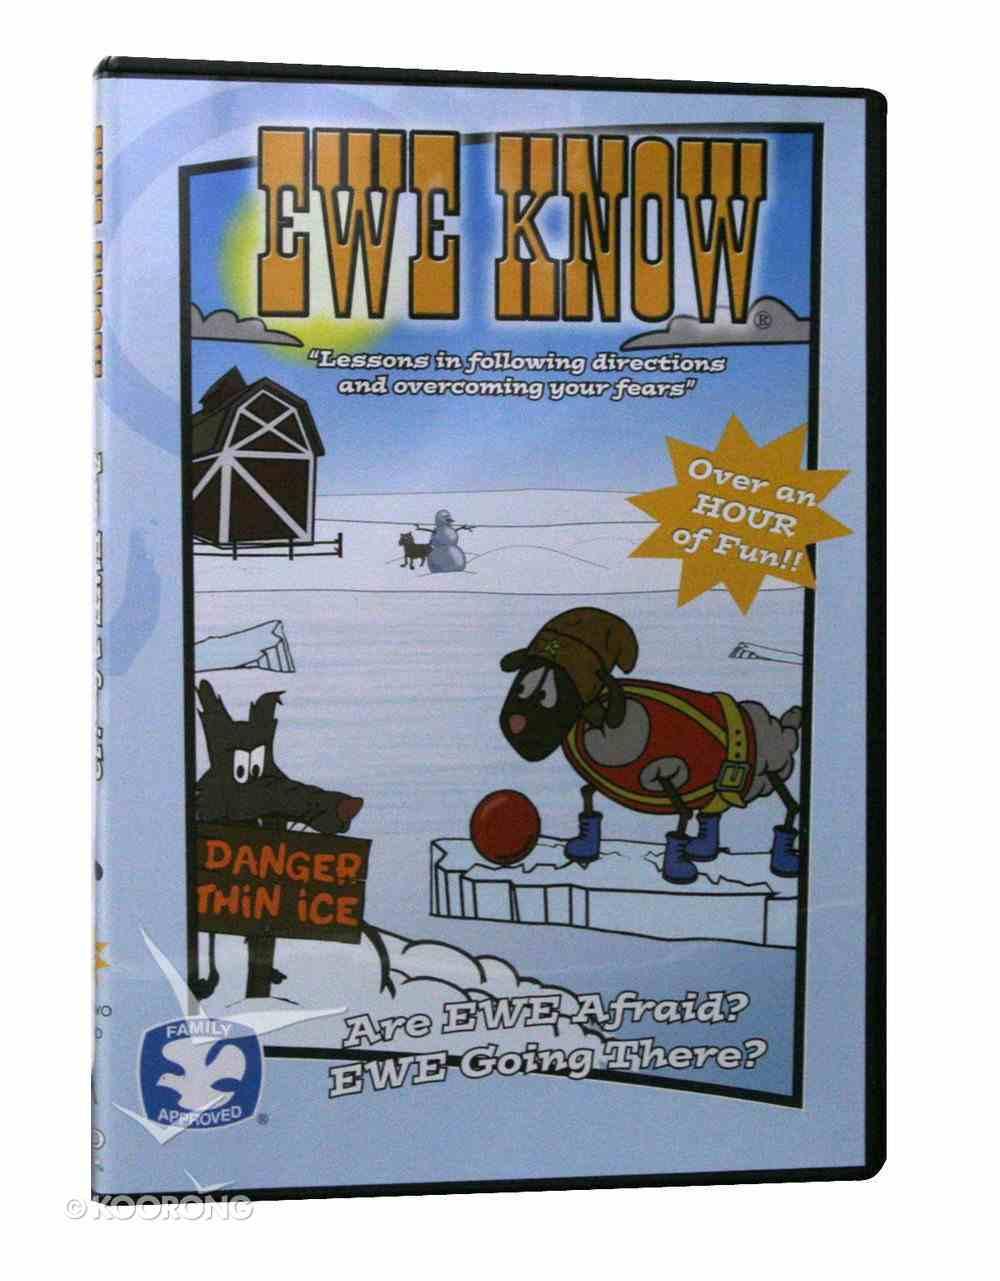 Are Ewe Afraid?/Ewe Going There? (Ewe Know Series) DVD